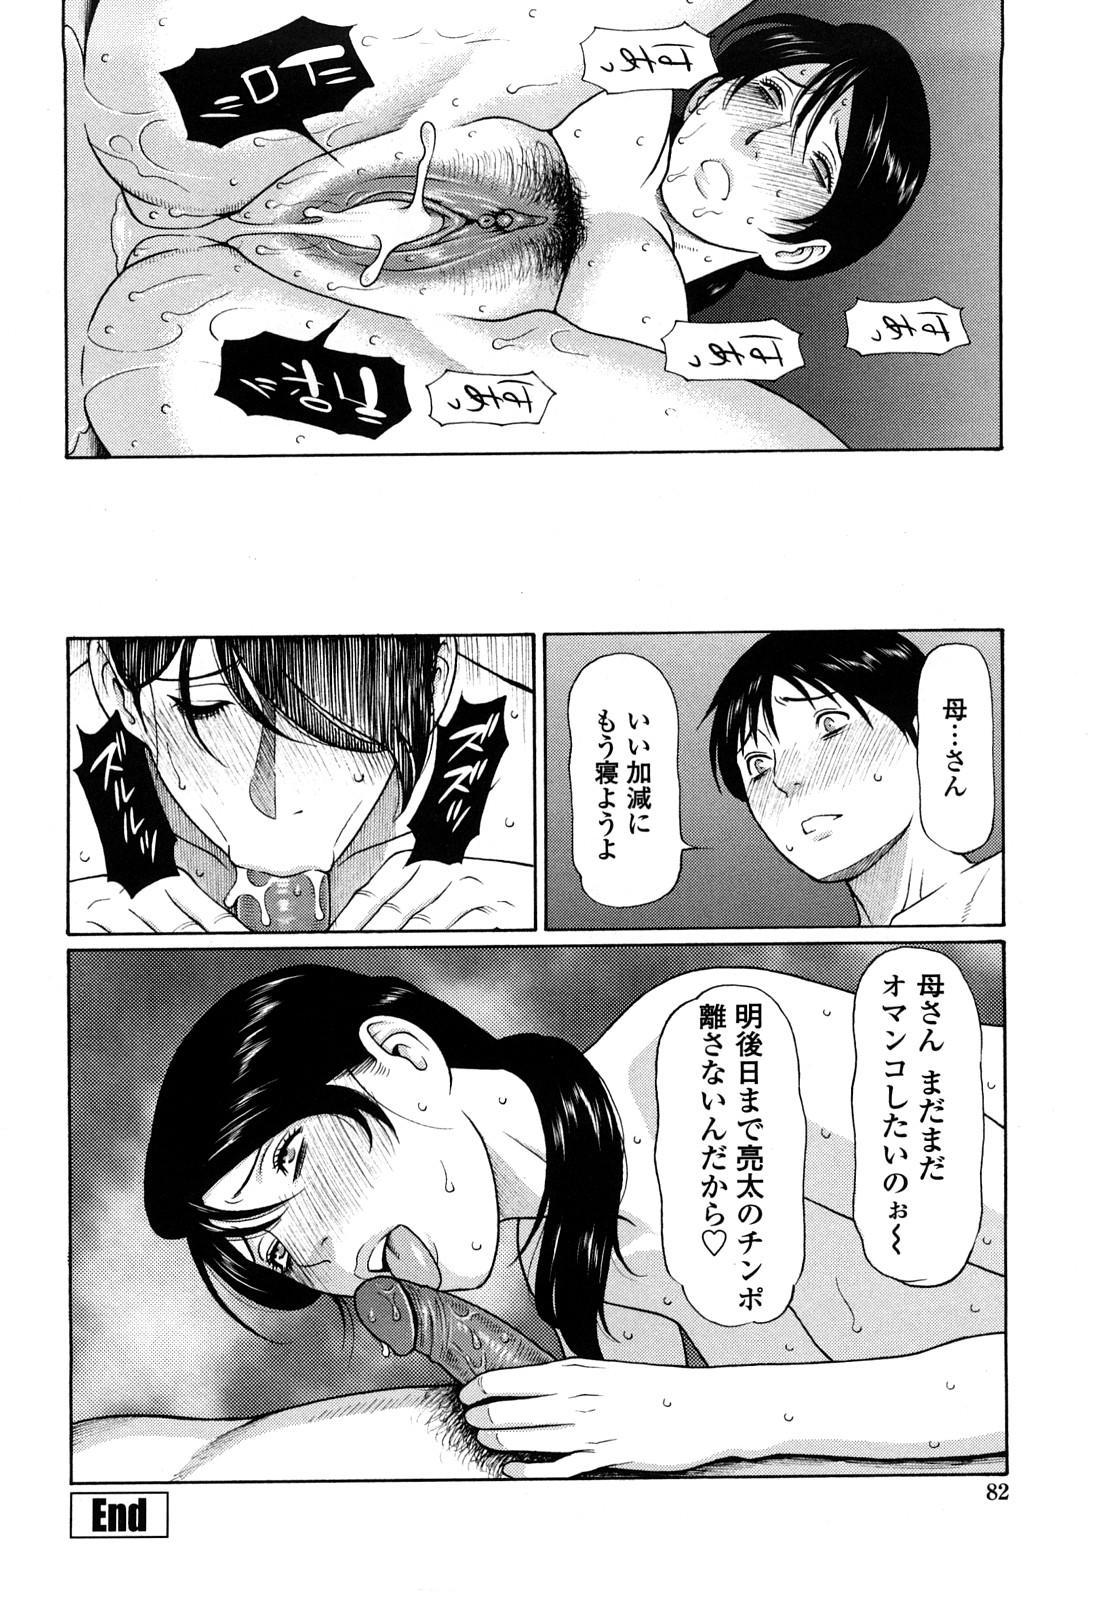 [Takasugi Kou] Kindan no Haha-Ana - Immorality Love-Hole [Decensored] 83